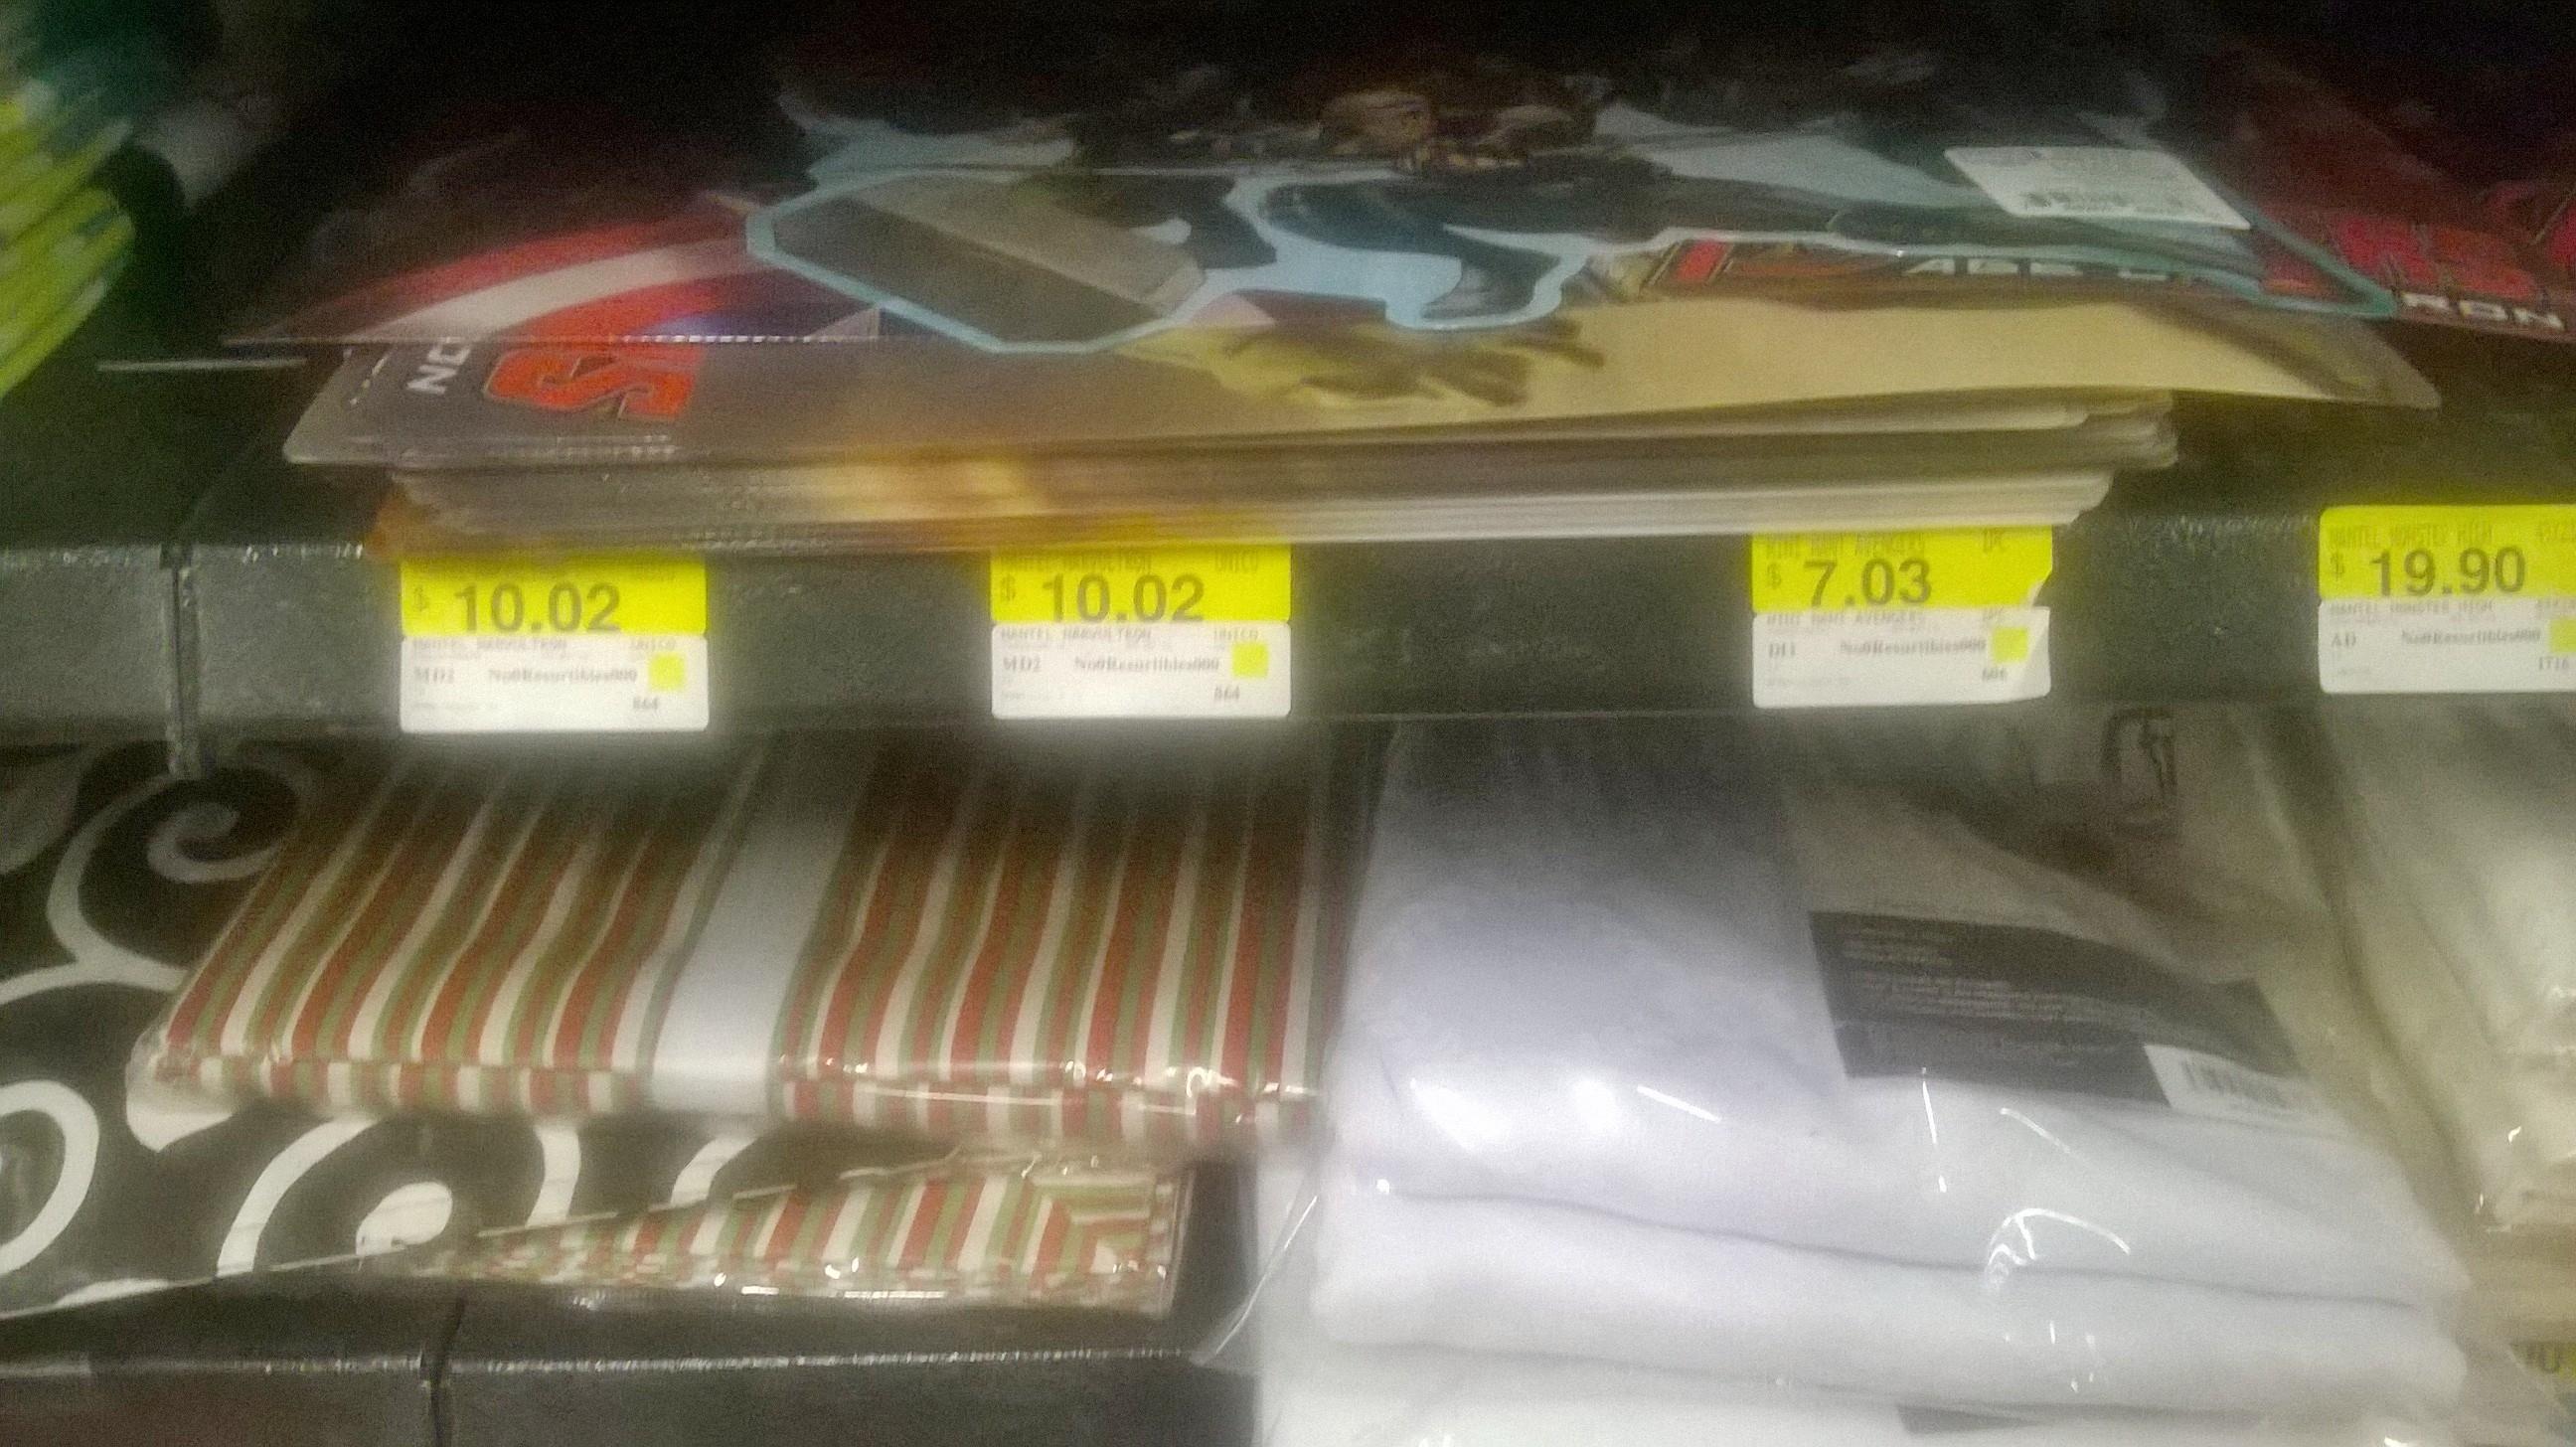 WalMart Manteles Avengers y Vasos Angry Birds desde $7.03